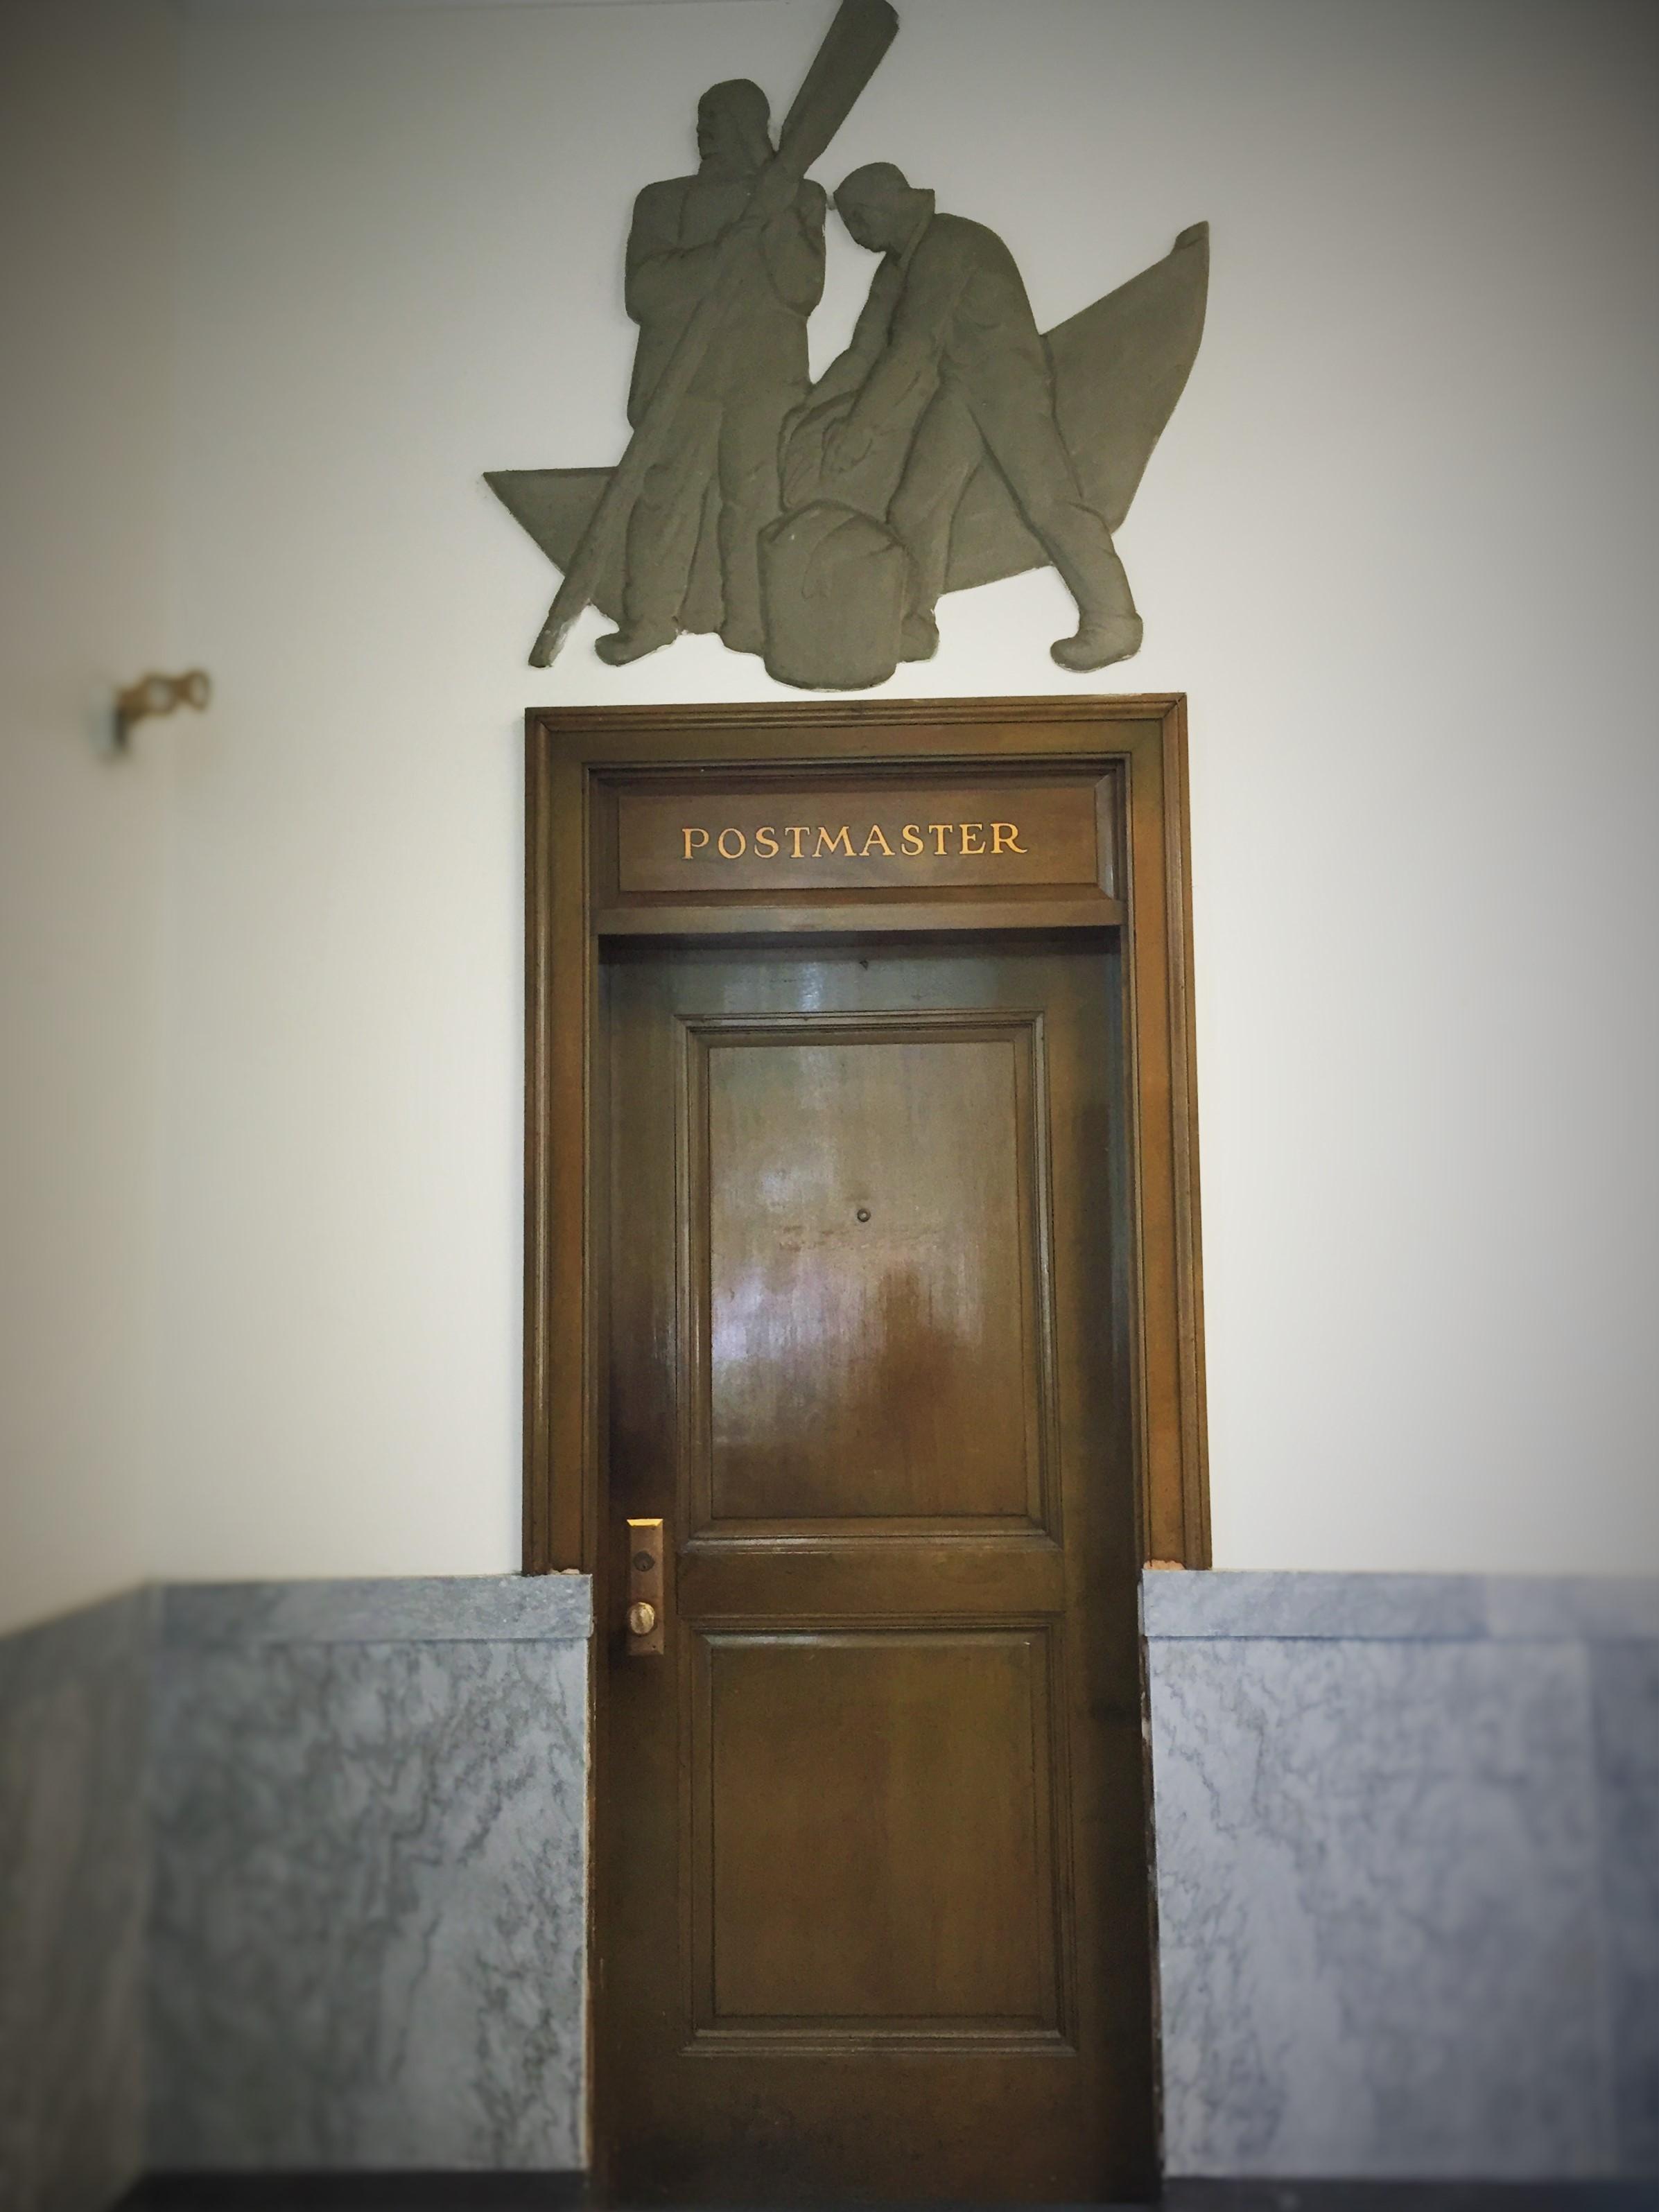 Postmaster art, Hyannis, Mass. Photo credit: M. Ciavardini